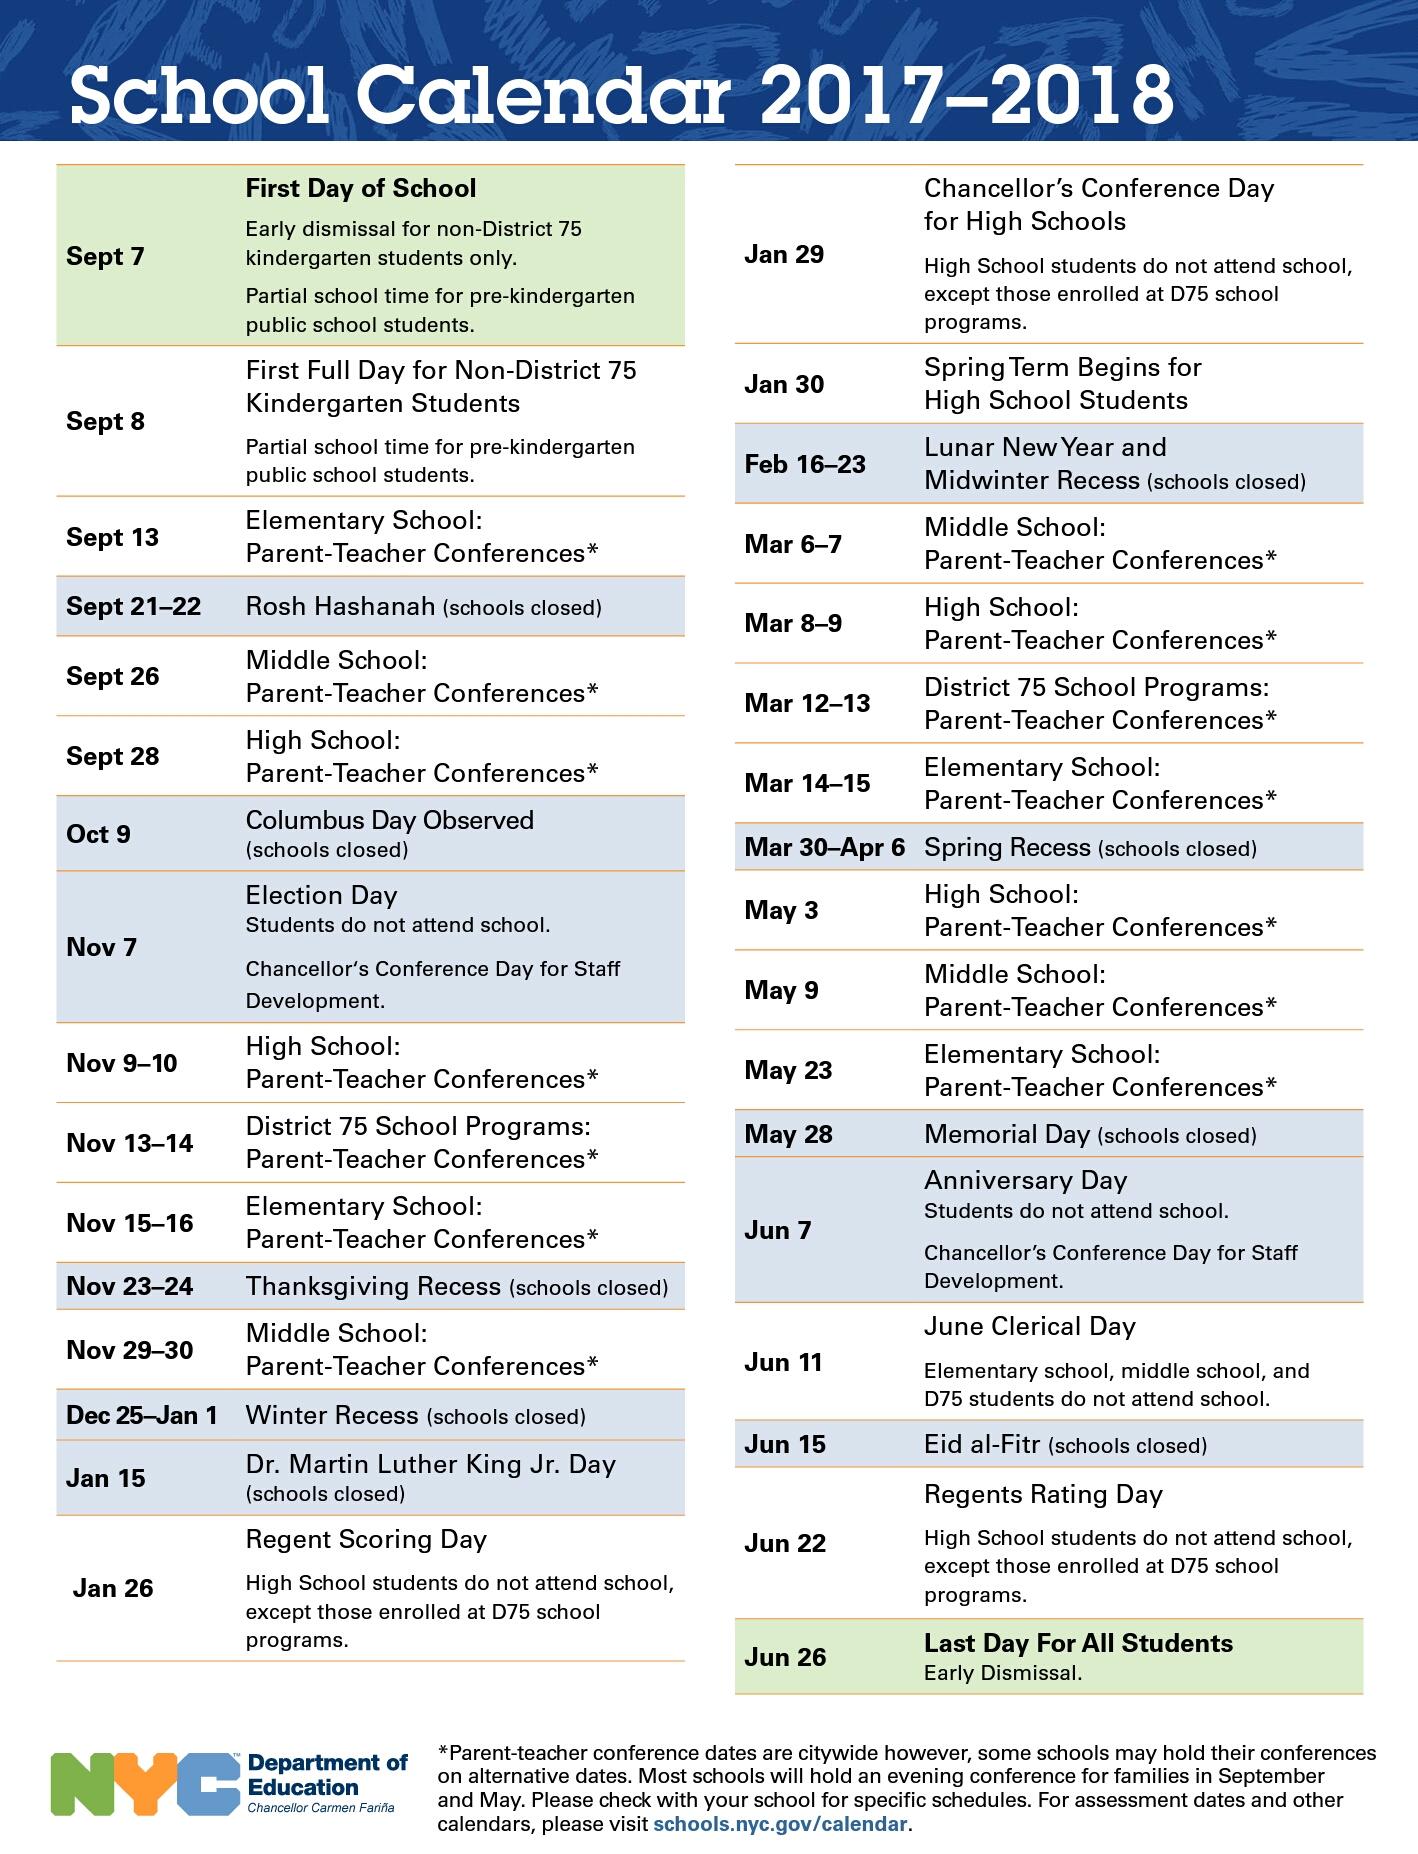 2017  2018 Nyc Public Schools' Calendar - Uft Solidarity With Nyc Dept Of Ed Calendar